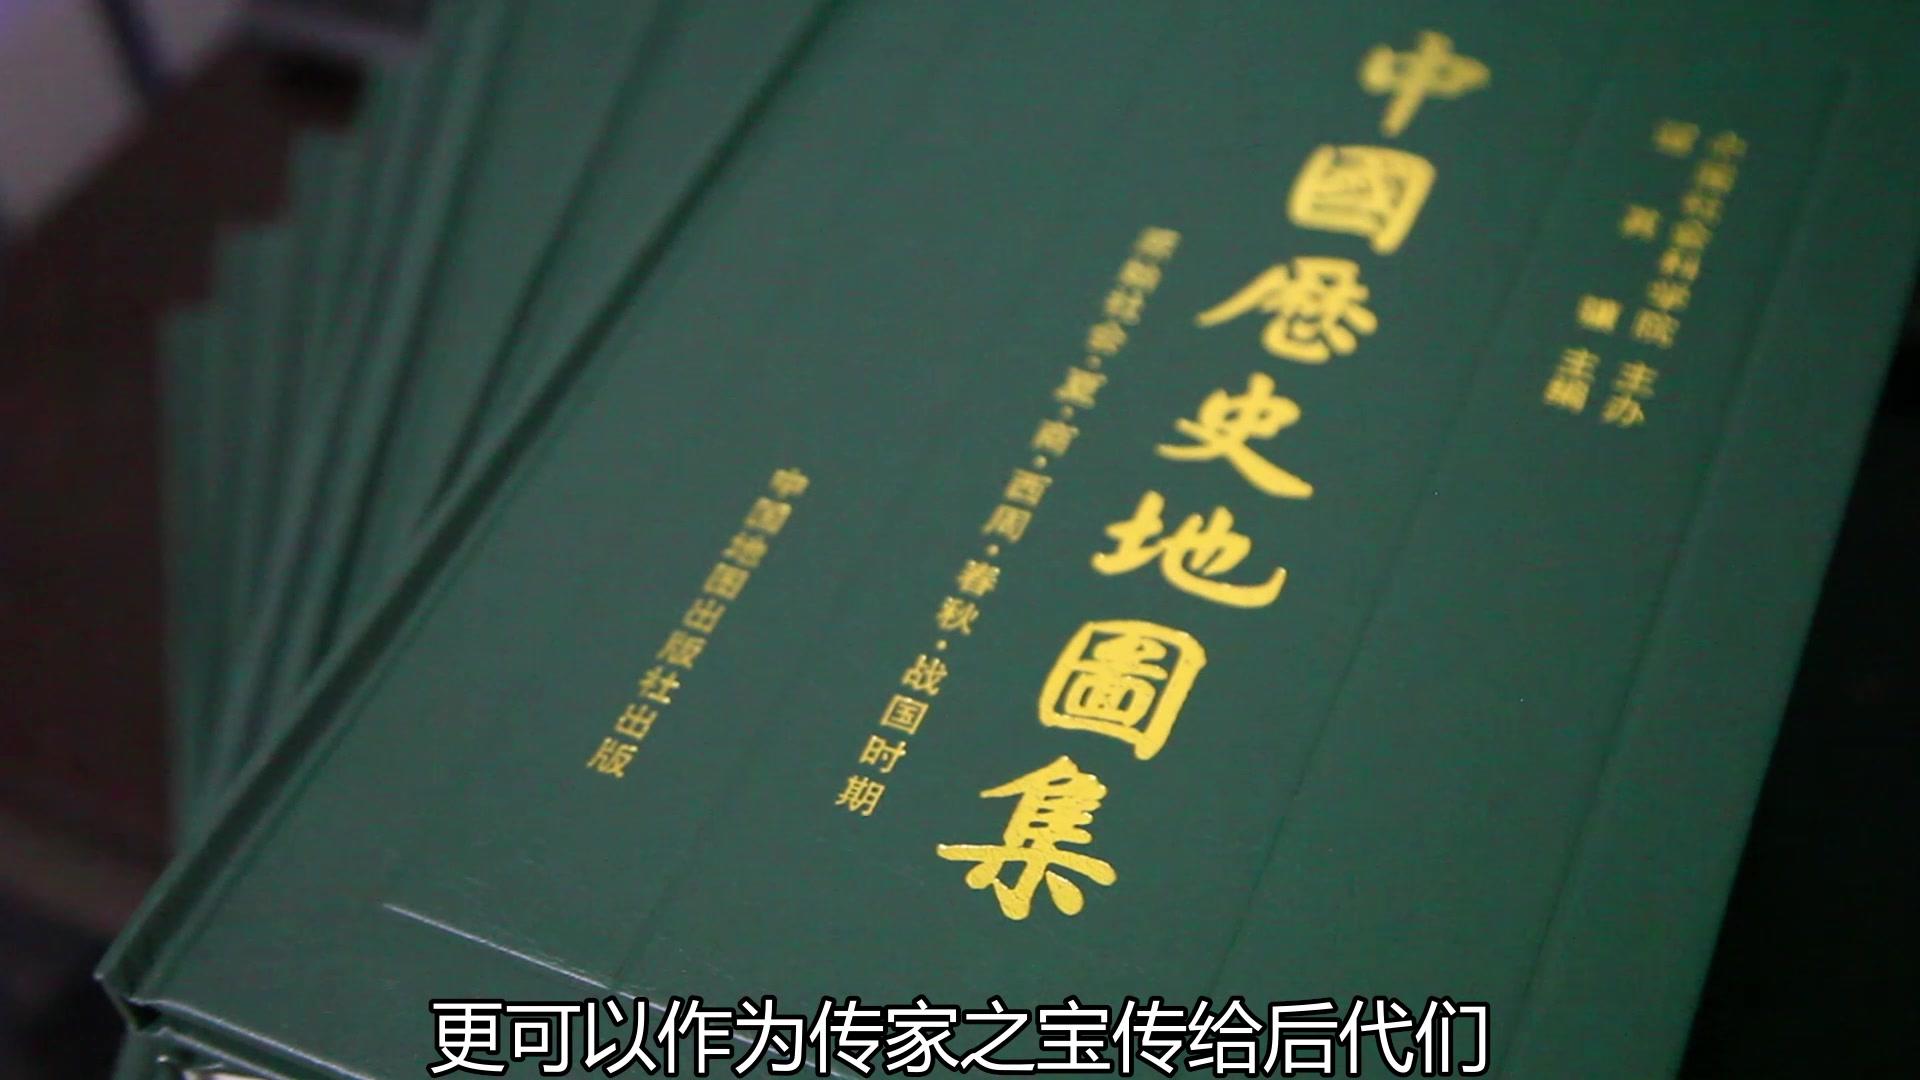 [讀書等身]《中國歷史地圖集》里有哪些有趣的地方_嗶哩嗶哩 (゜-゜)つロ 干杯~-bilibili